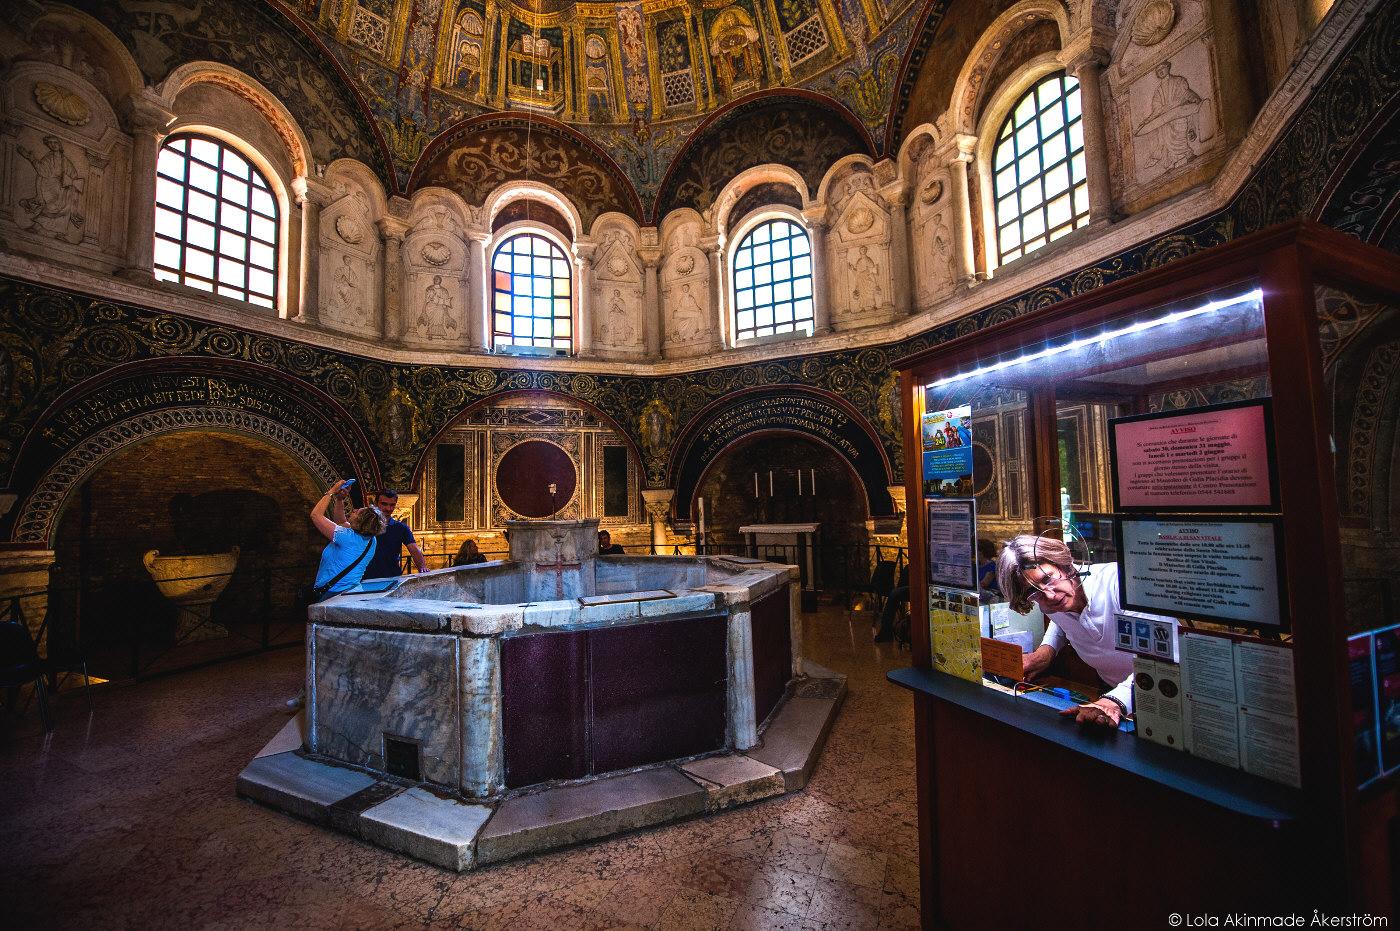 UNESCO World Heritage Site Ravenna